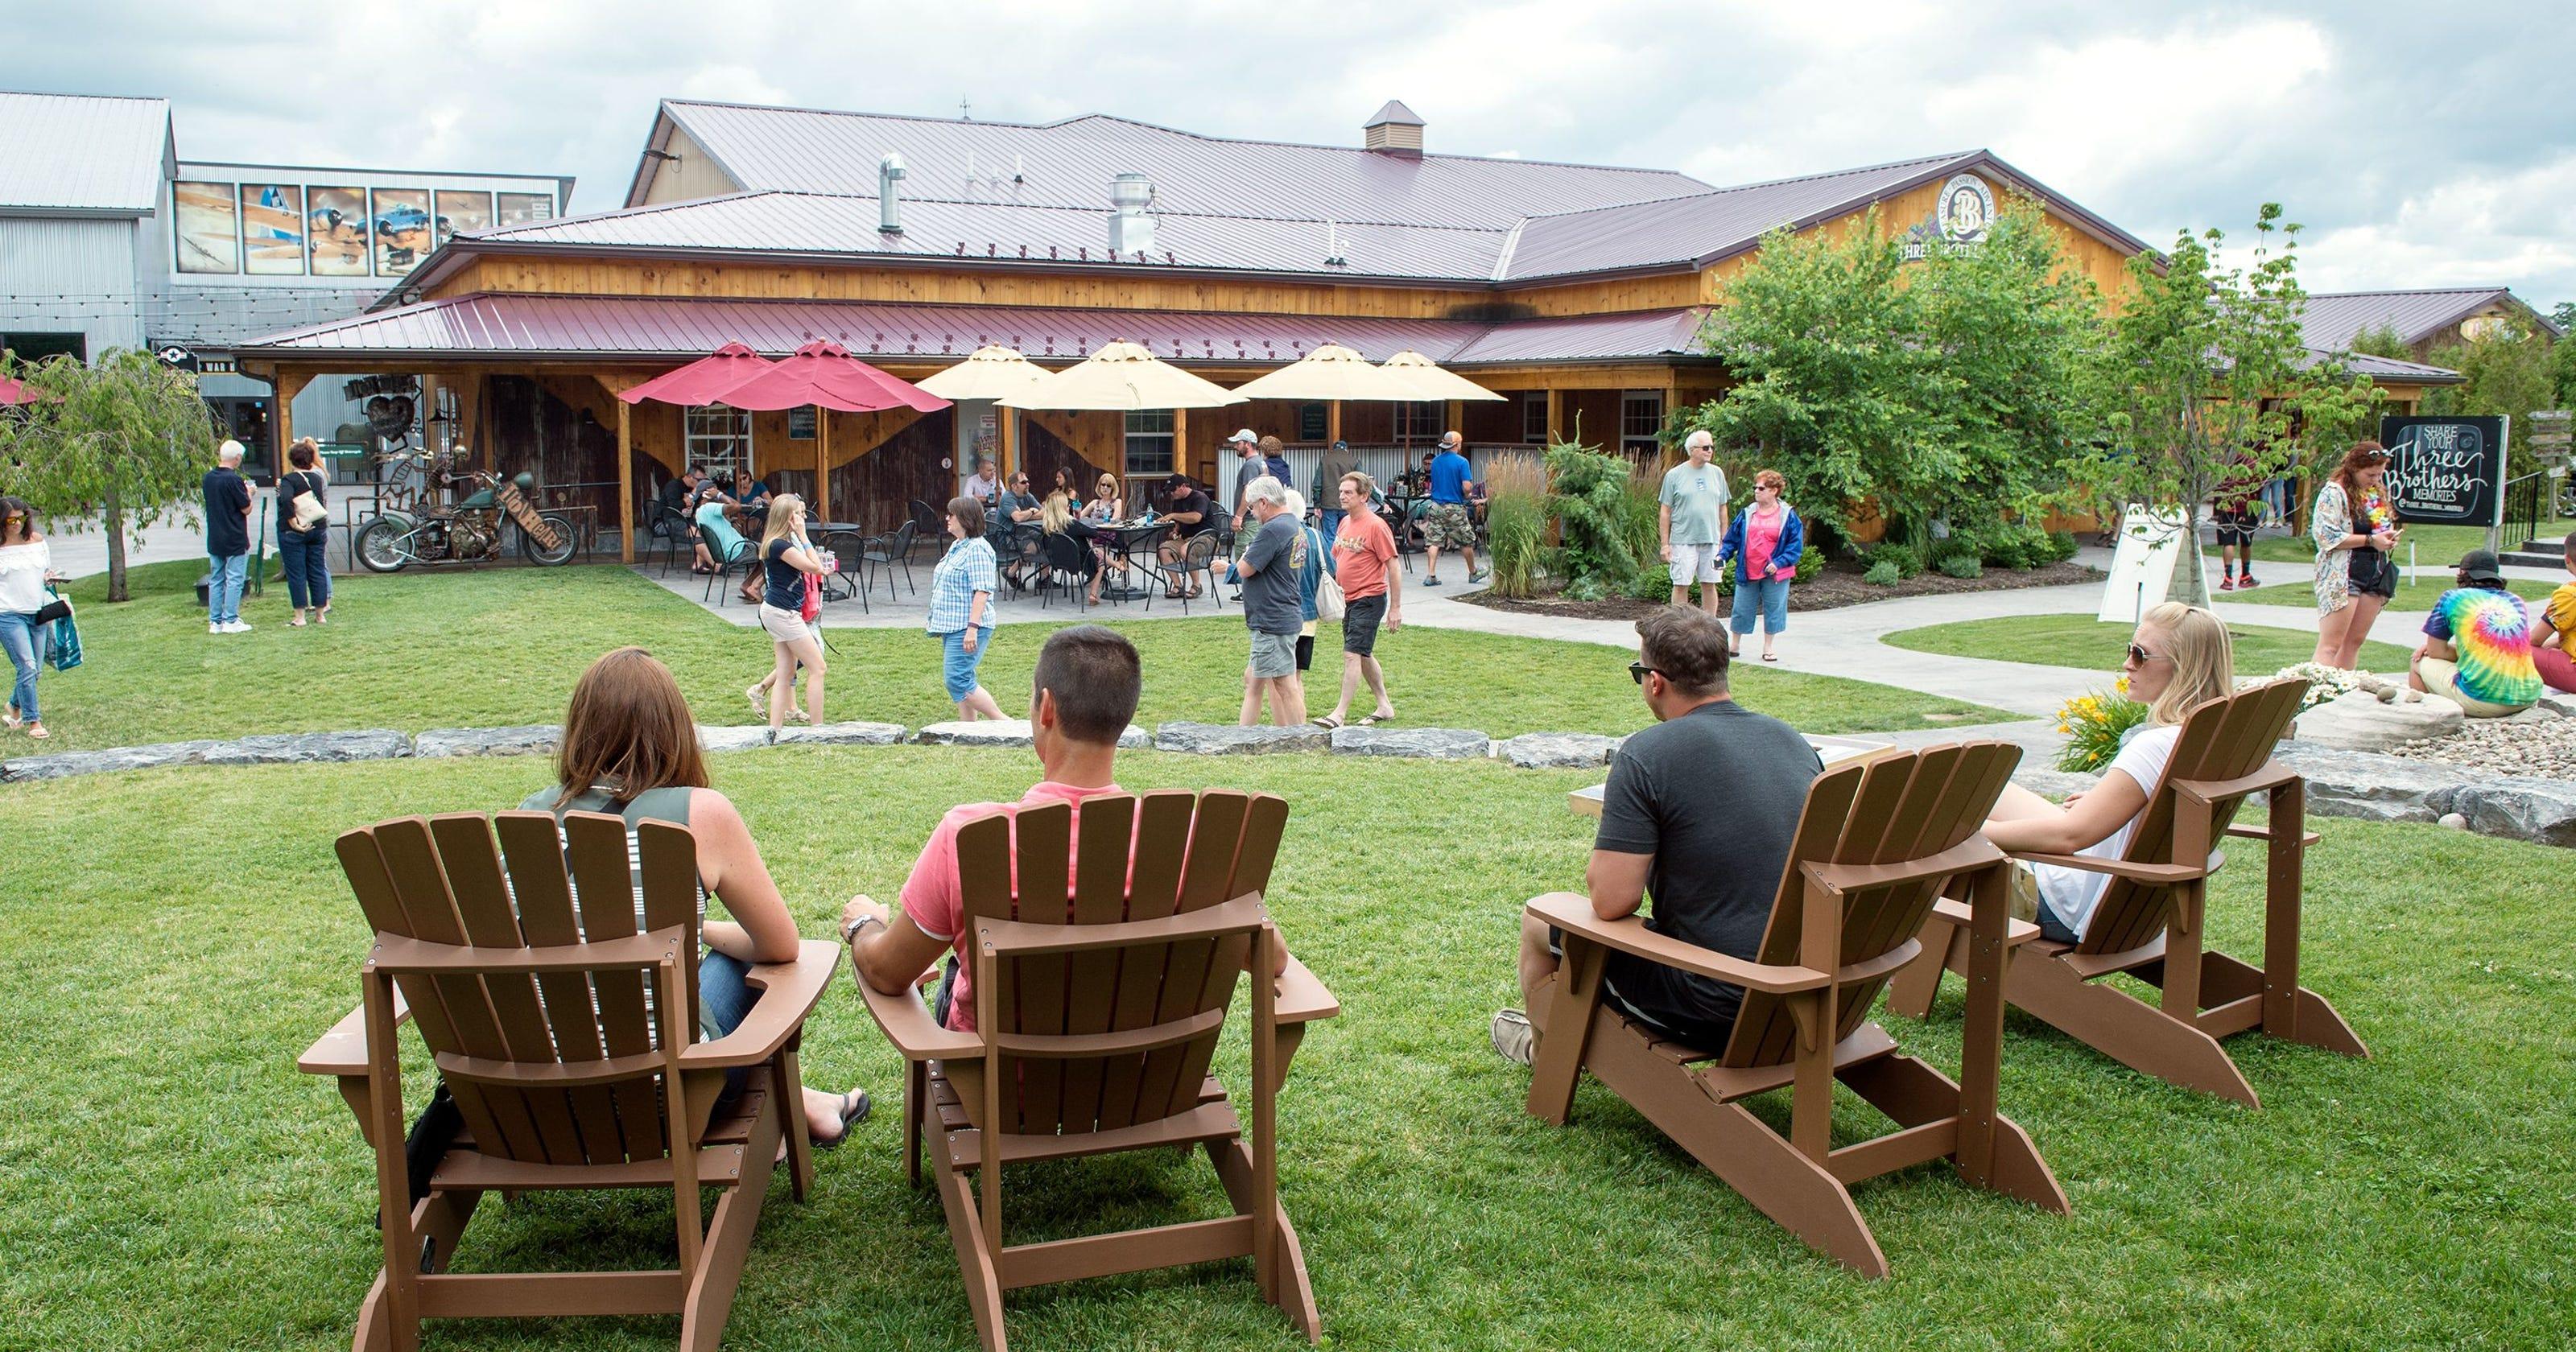 Weekend In The Finger Lakes: Wineries, Restaurants On Northern Seneca Lake Near Geneva photo